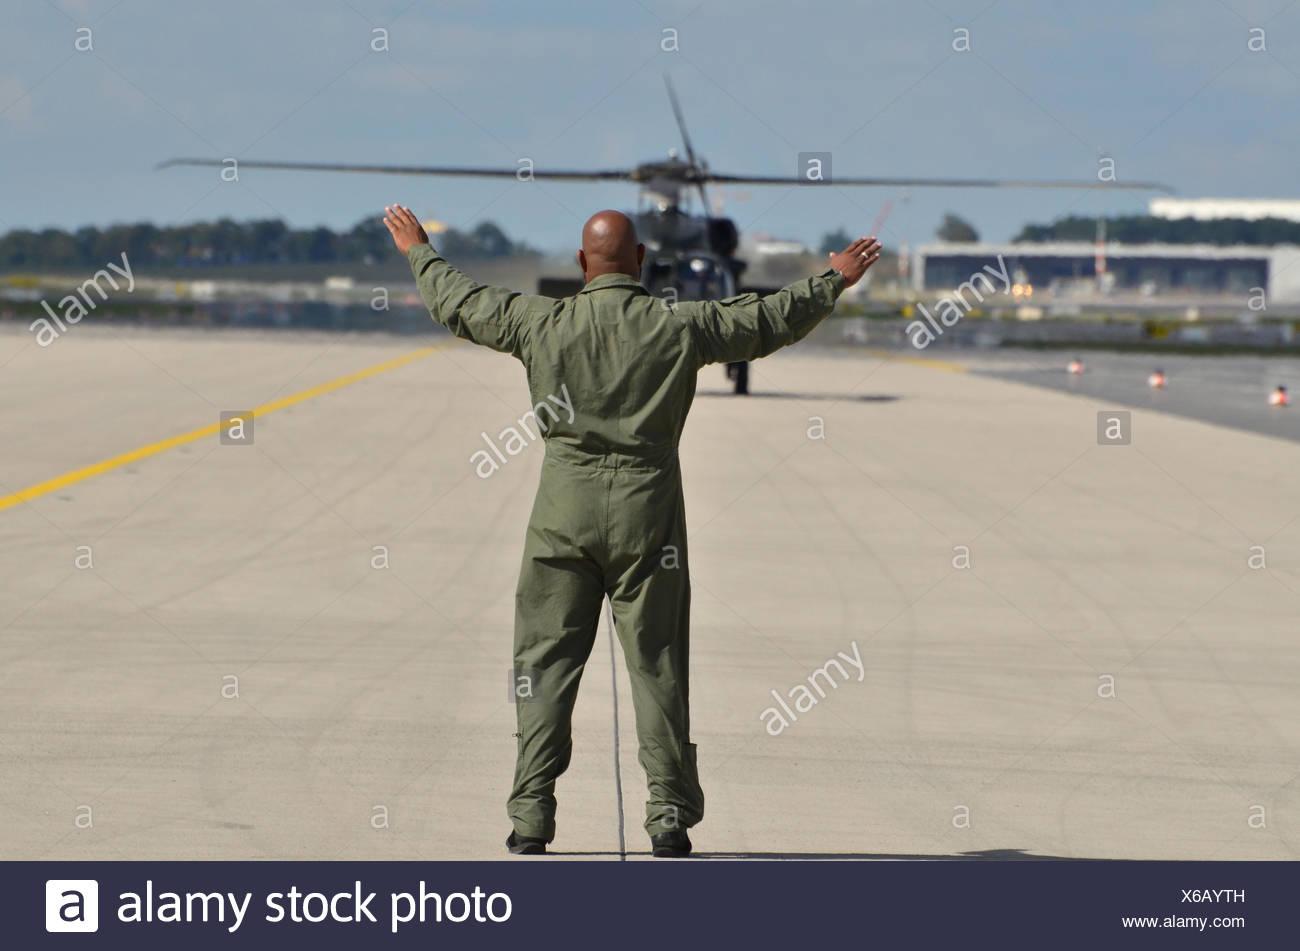 Germany, Berlin, ILA 2012, runway, marshaller, military helicopter, - Stock Image